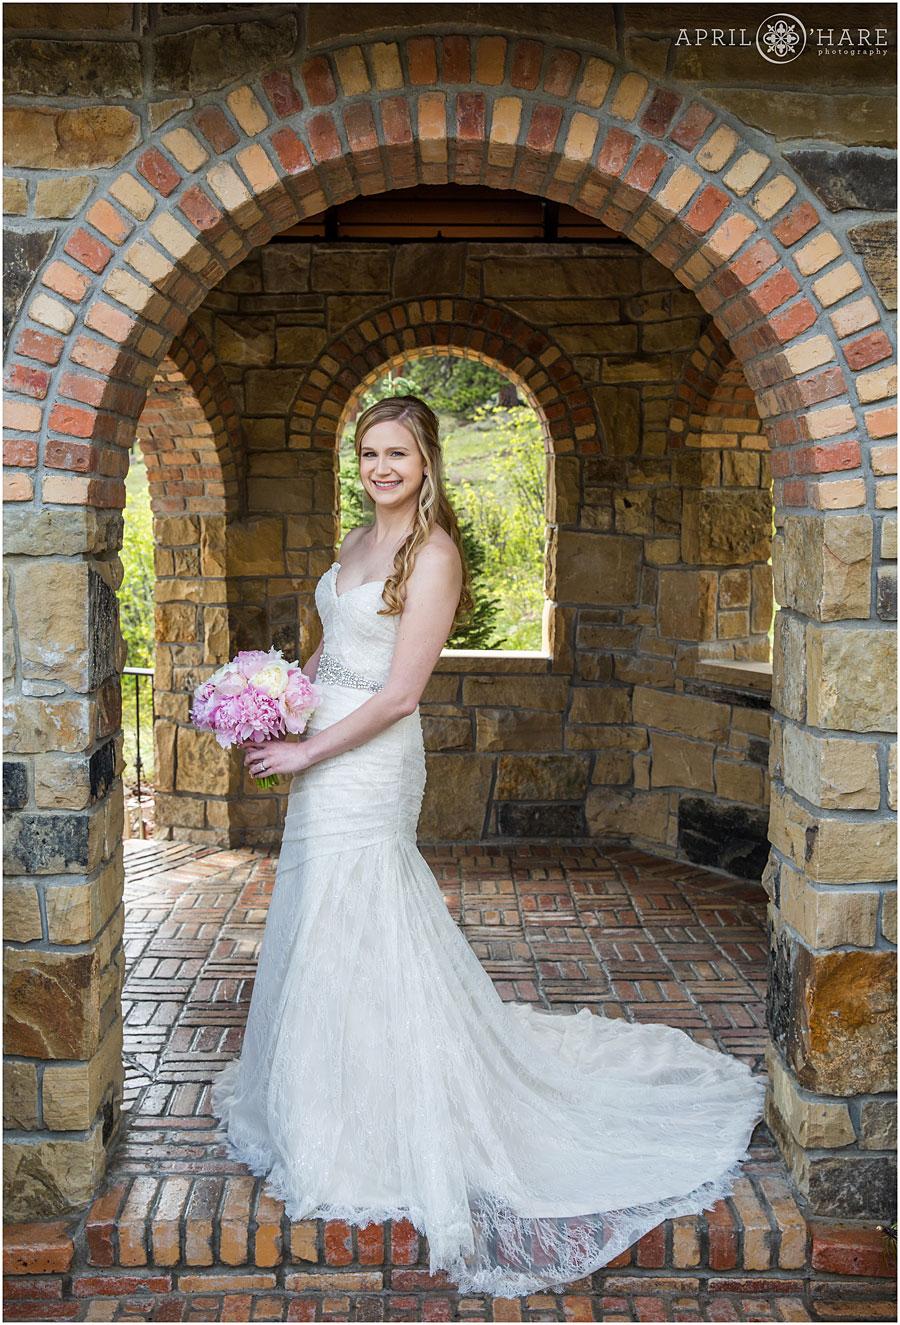 Full-Length-Bridal-Portrait-at-Stone-Gazebo-at-Della-Terra-Mountain-Chateau-in-Estes-Park-Colorado.jpg